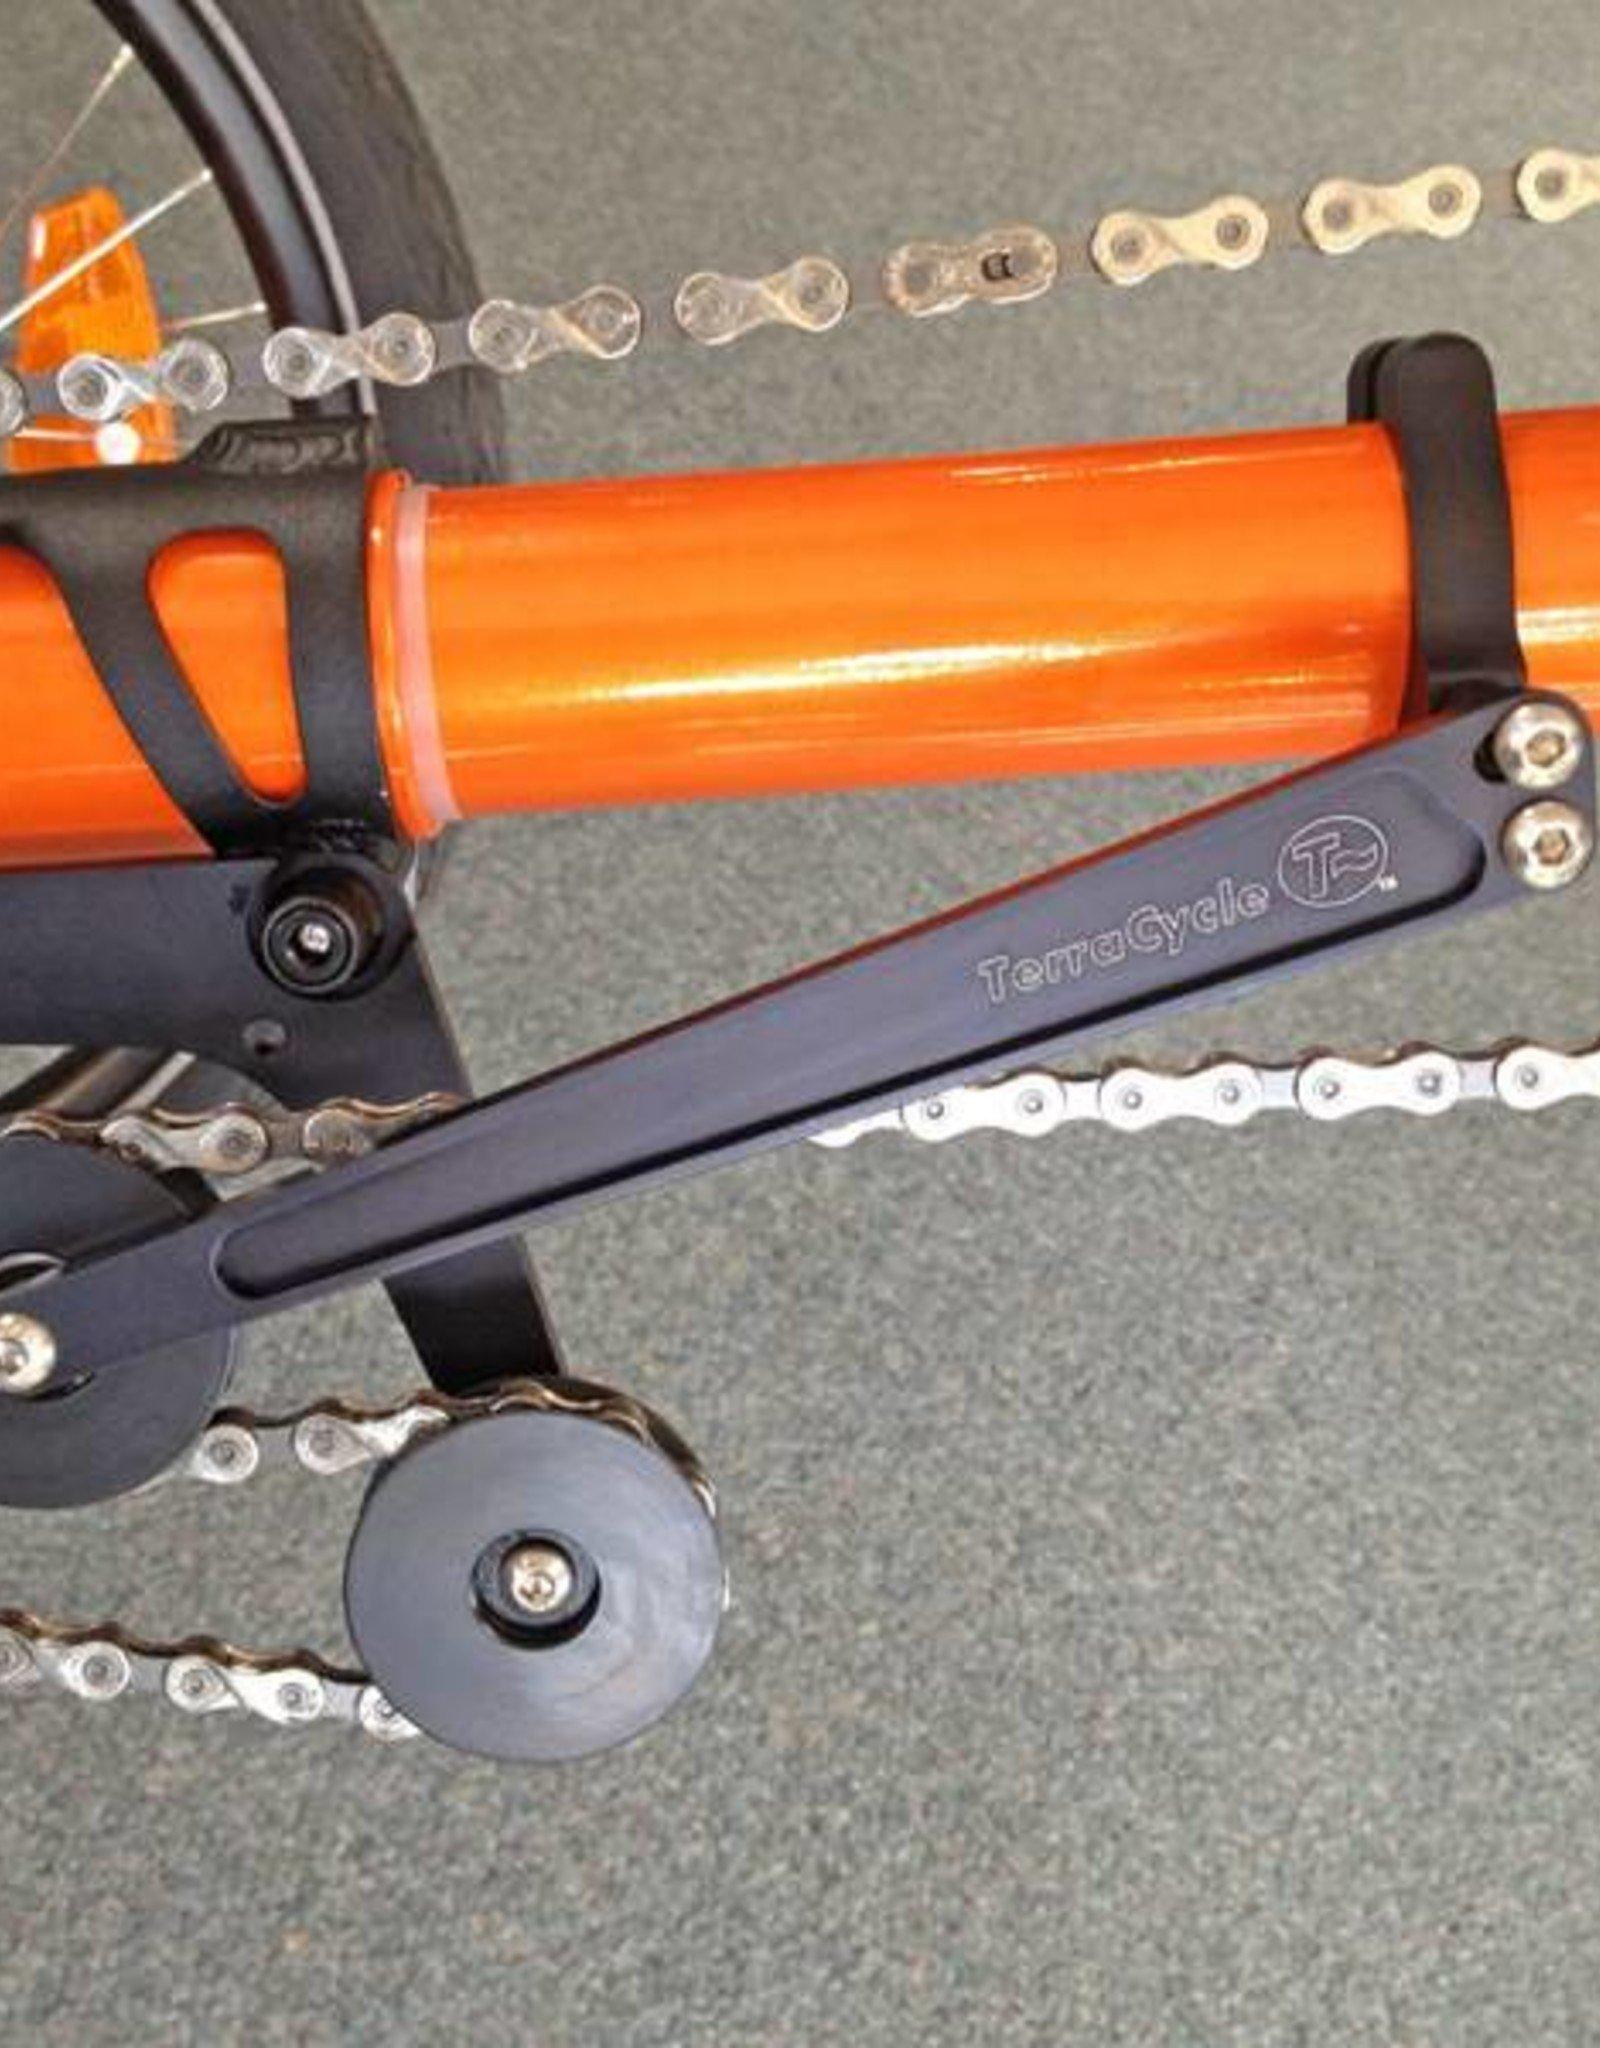 Terracycle Catrike Quick Adjust Kit